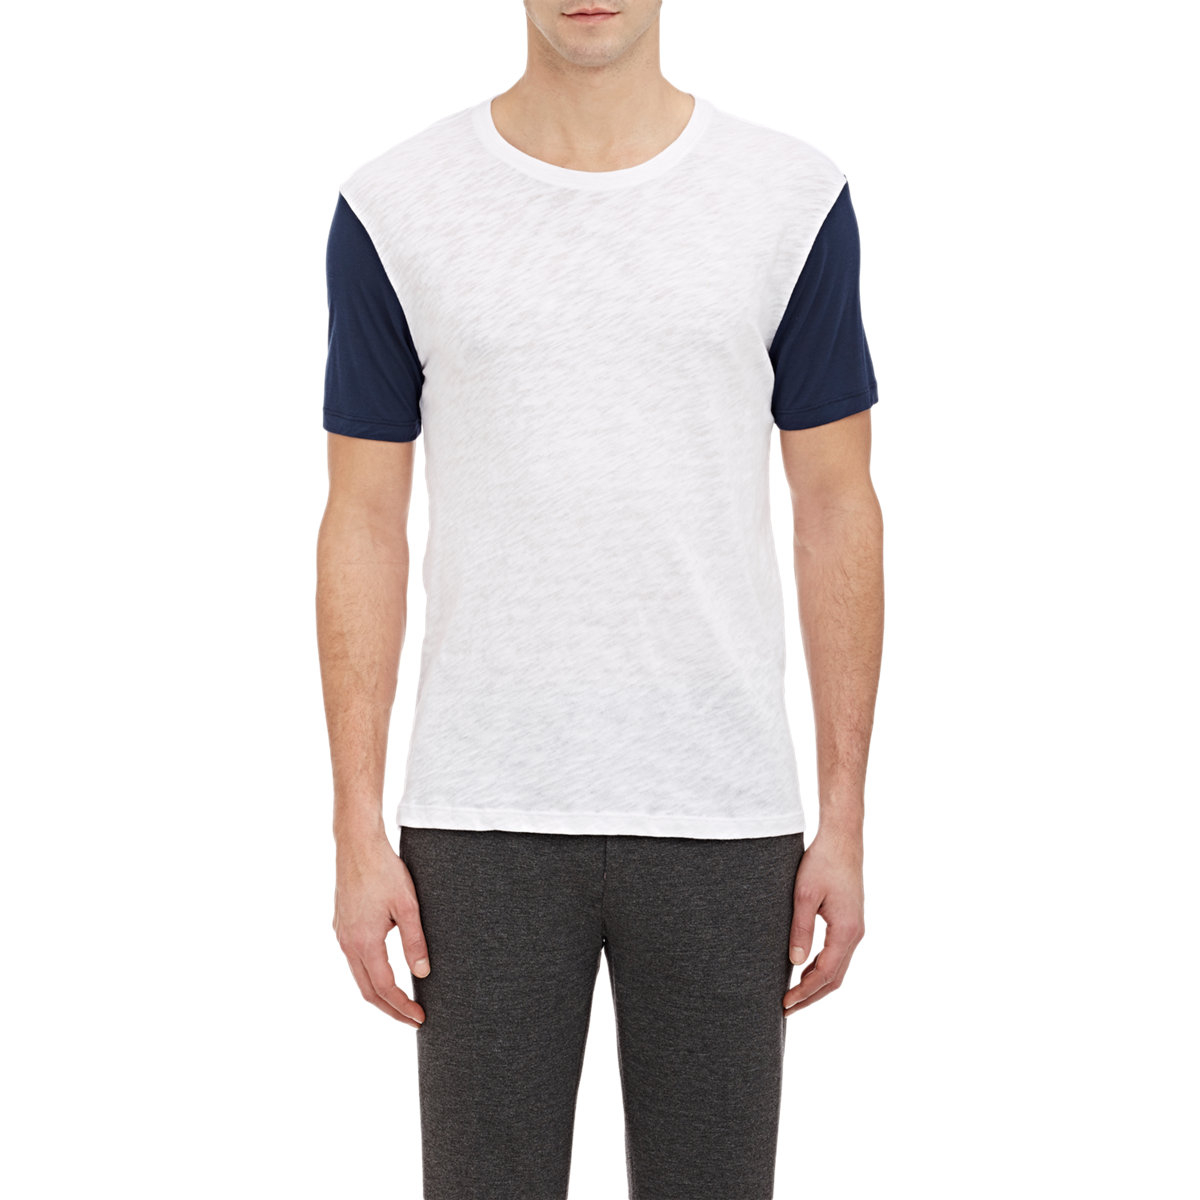 Atm jersey sleeve slub t shirt in blue for men lyst for Atm t shirt sale